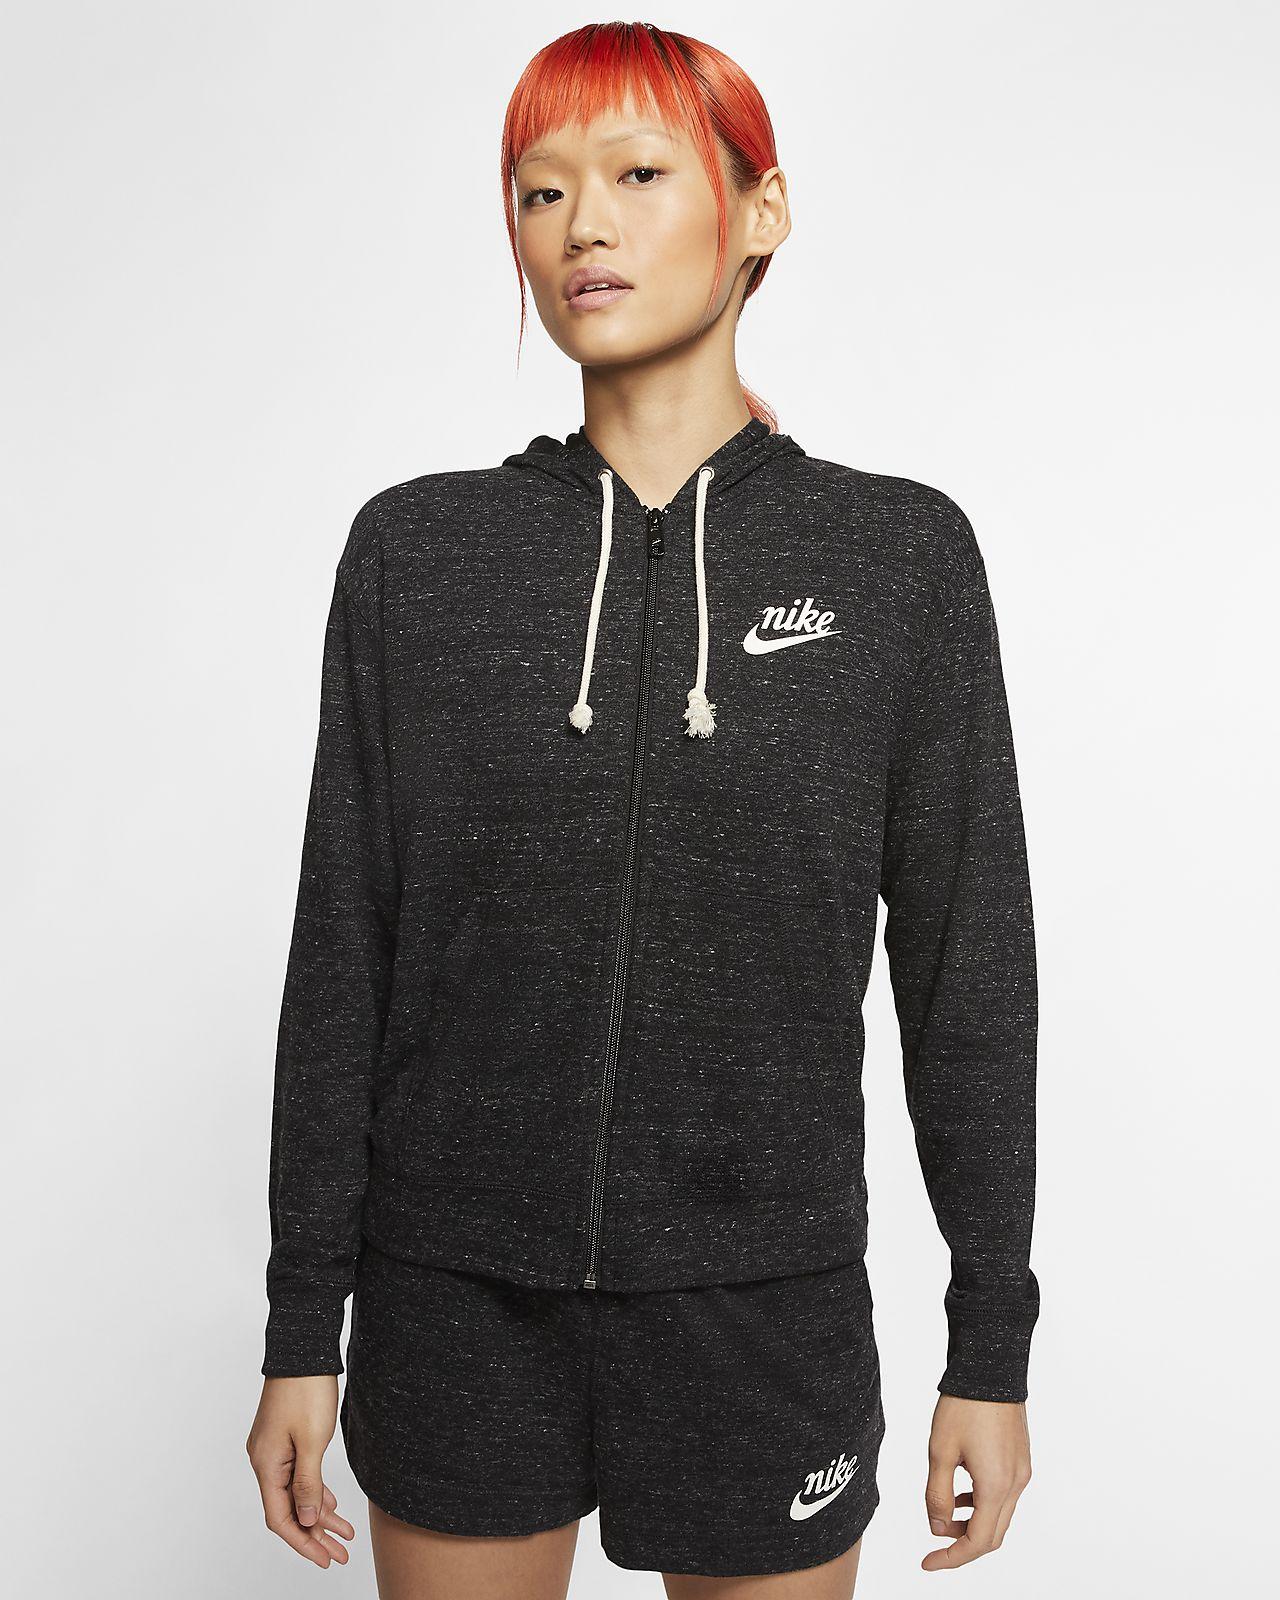 Felpa con cappuccio Nike Sportswear Gym Vintage Donna (Plus Size)